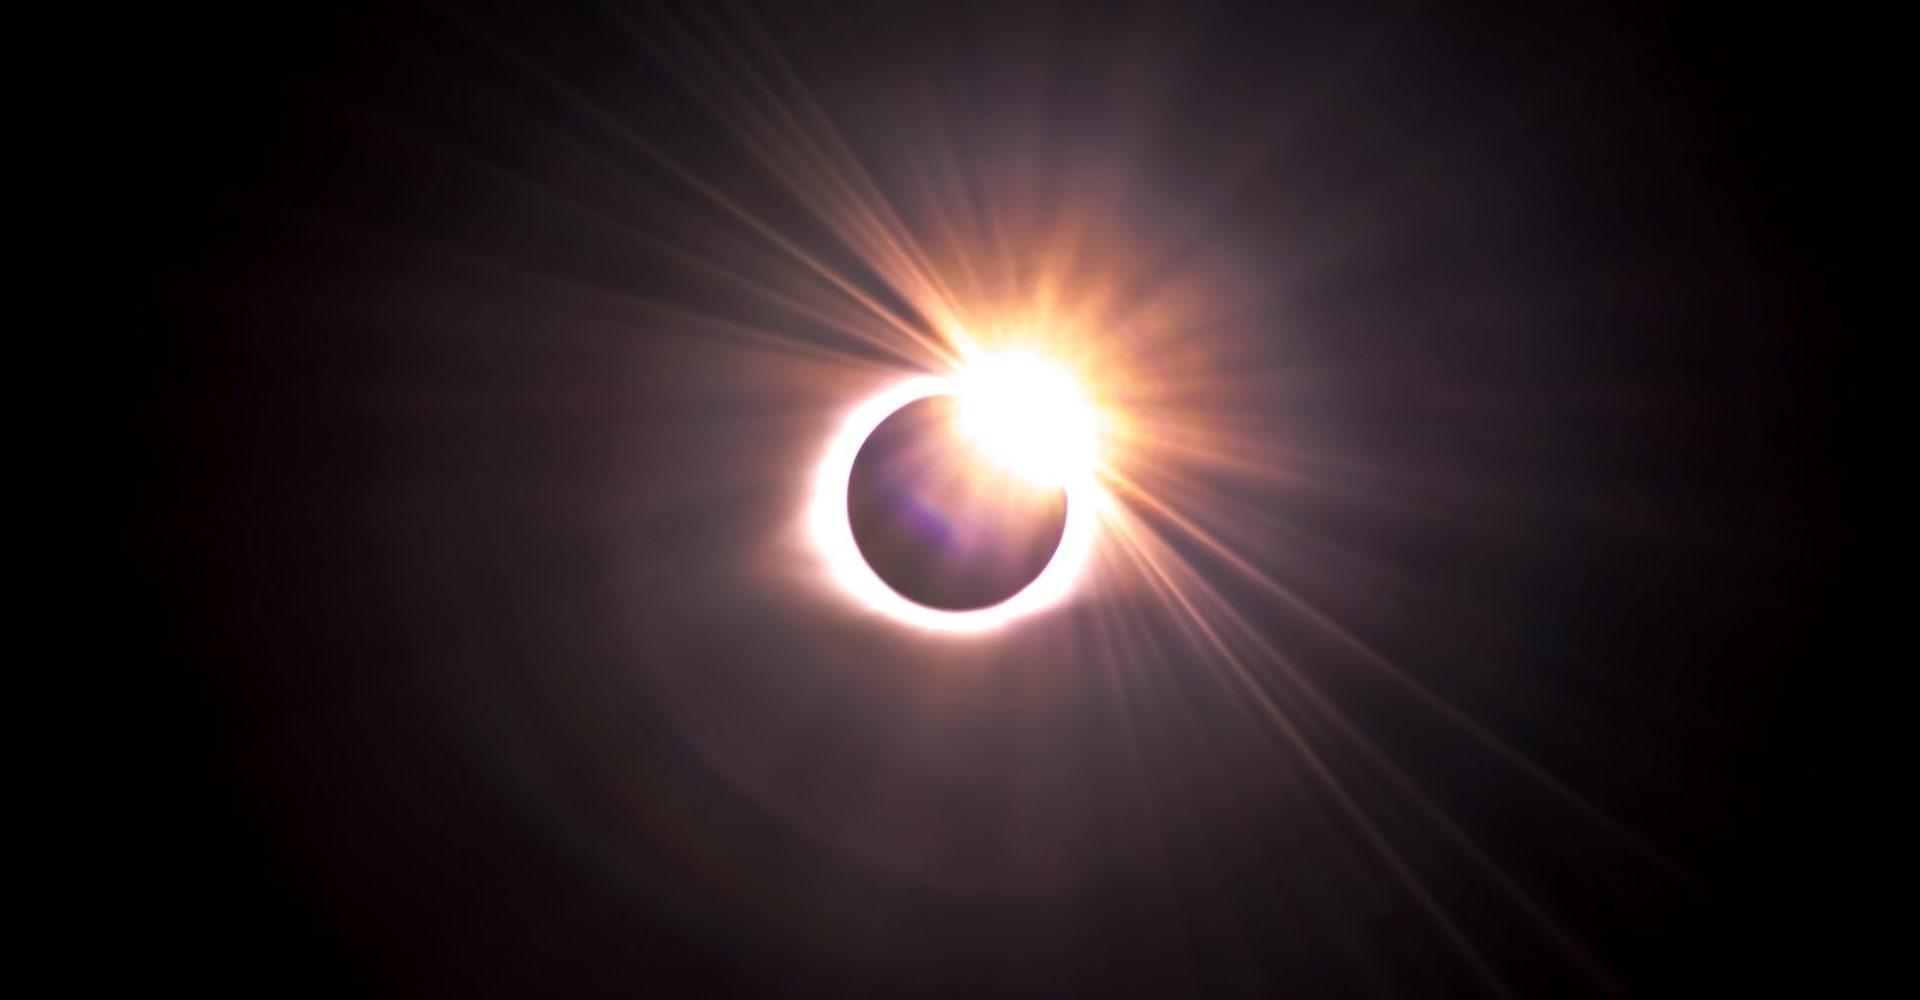 eclipse full moon mercury retrograde celestial hermit